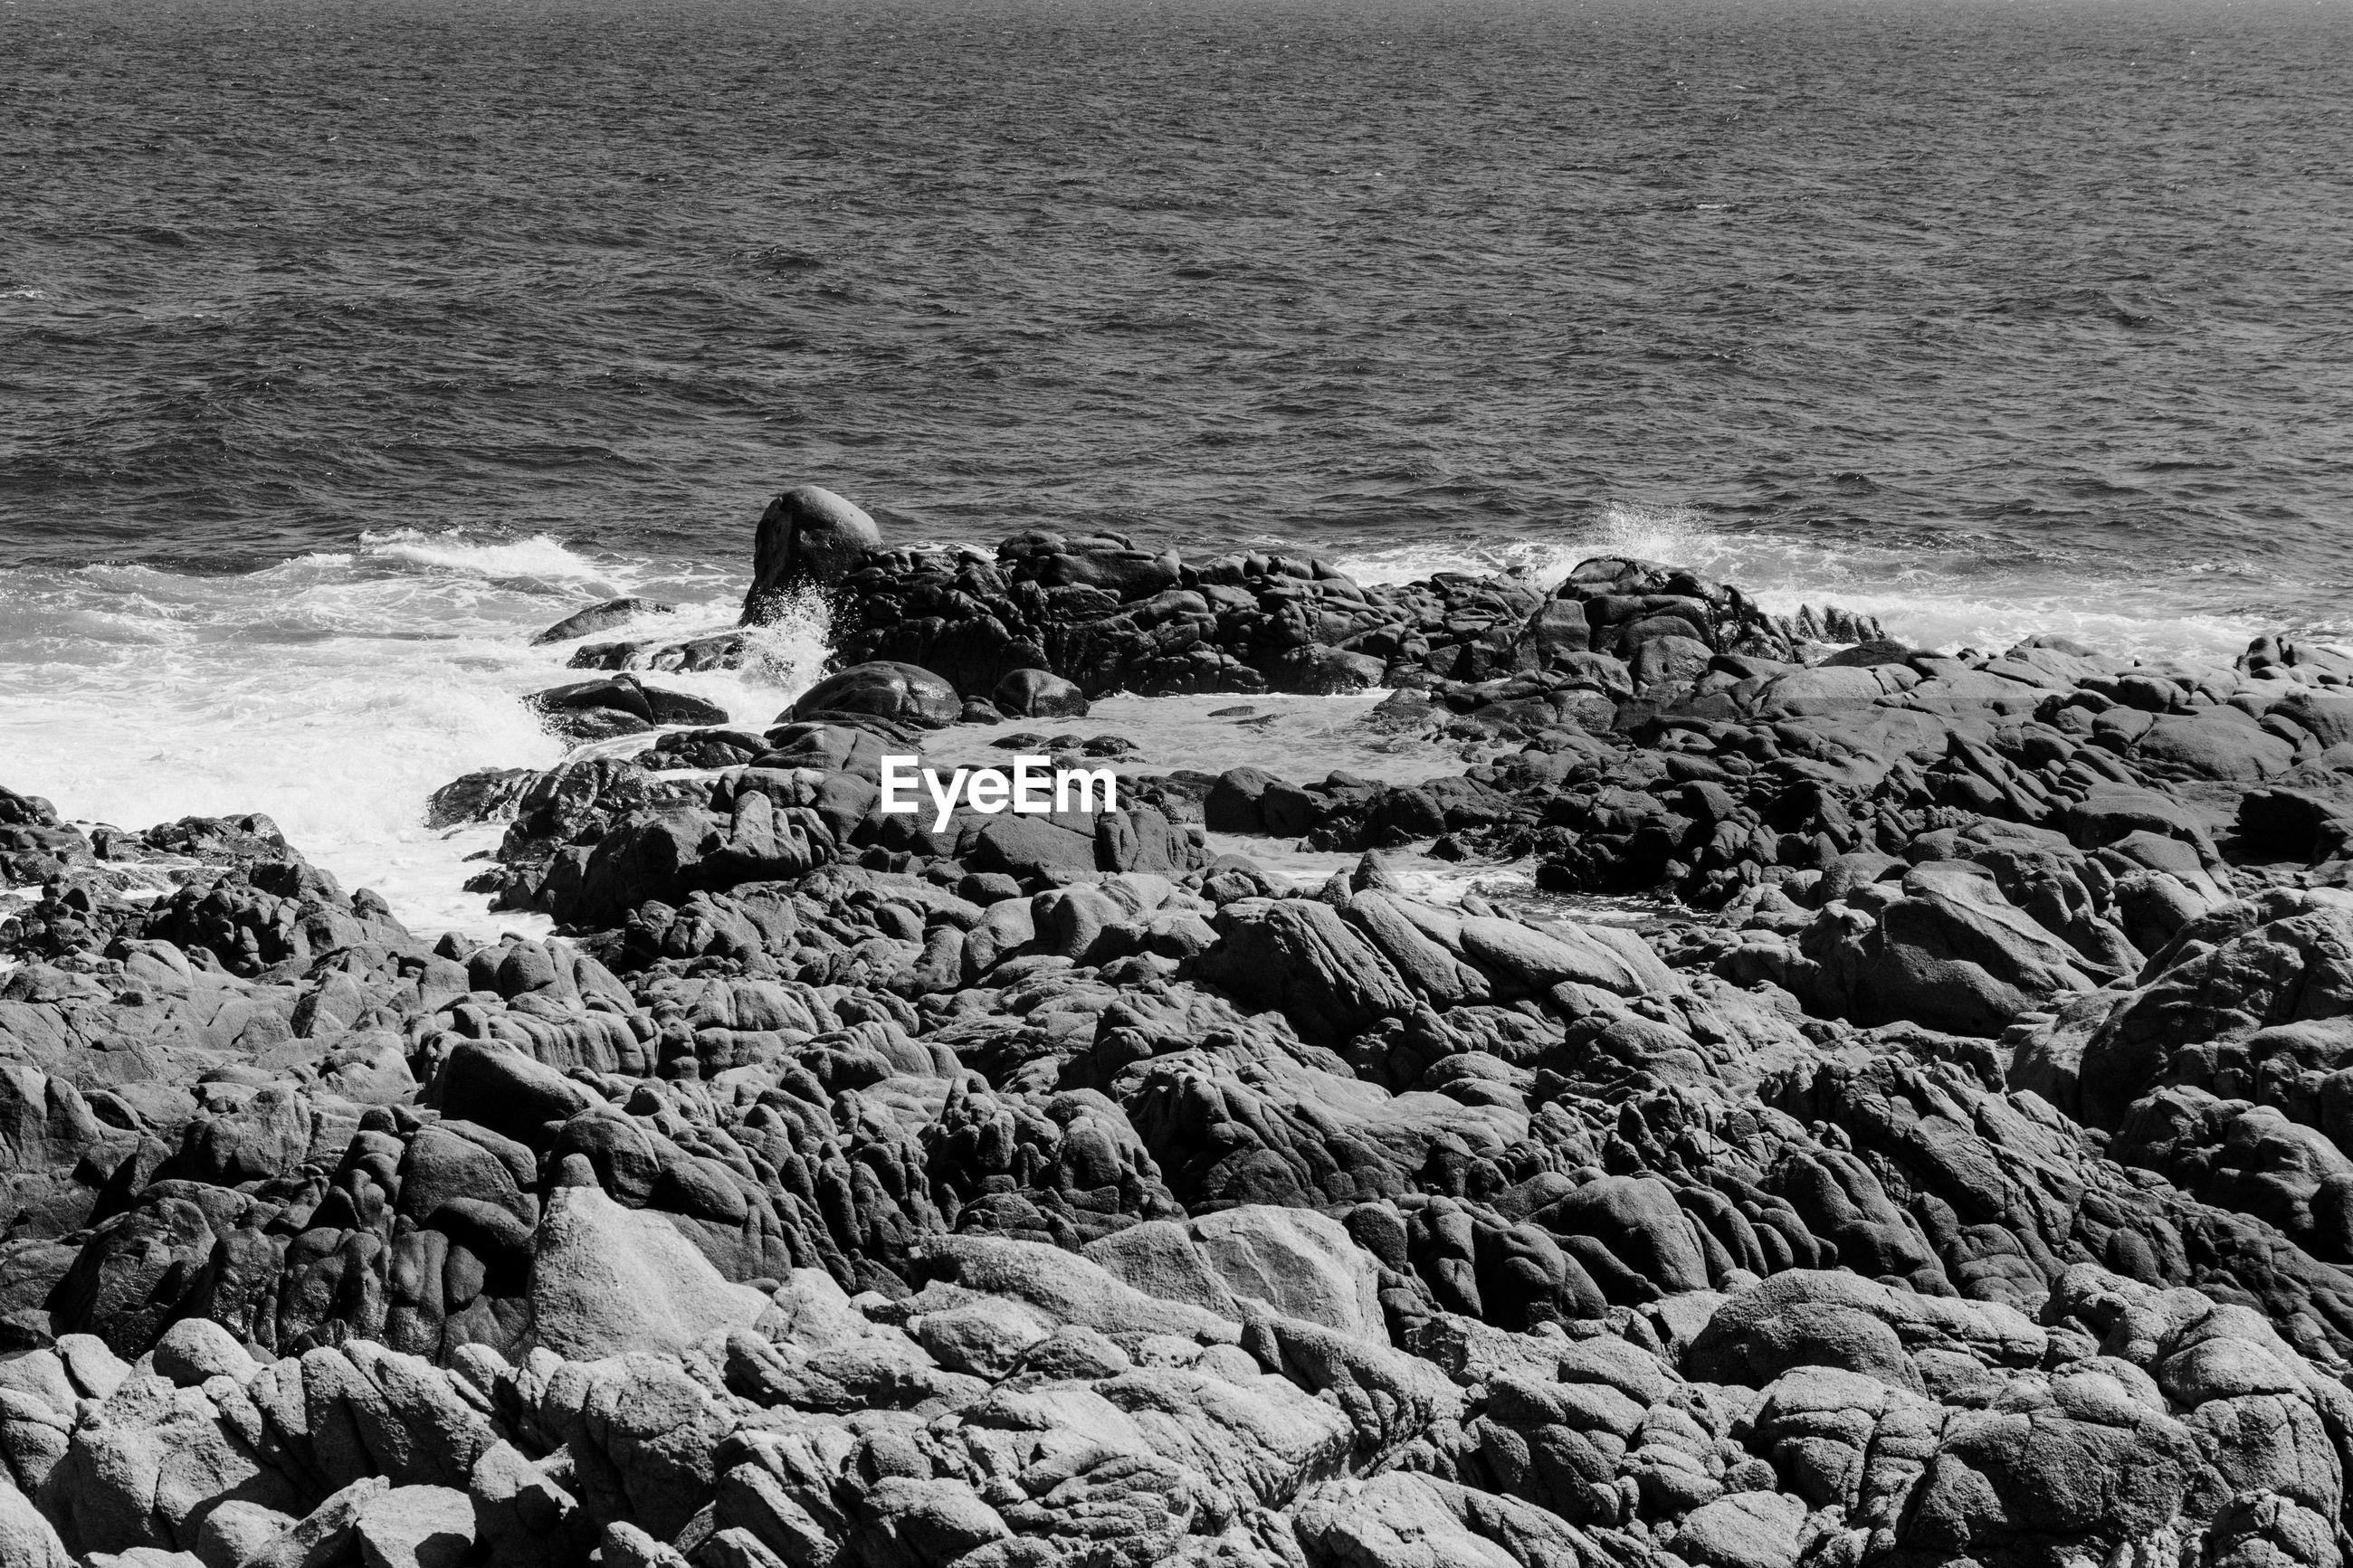 Scenic view of rocky beach